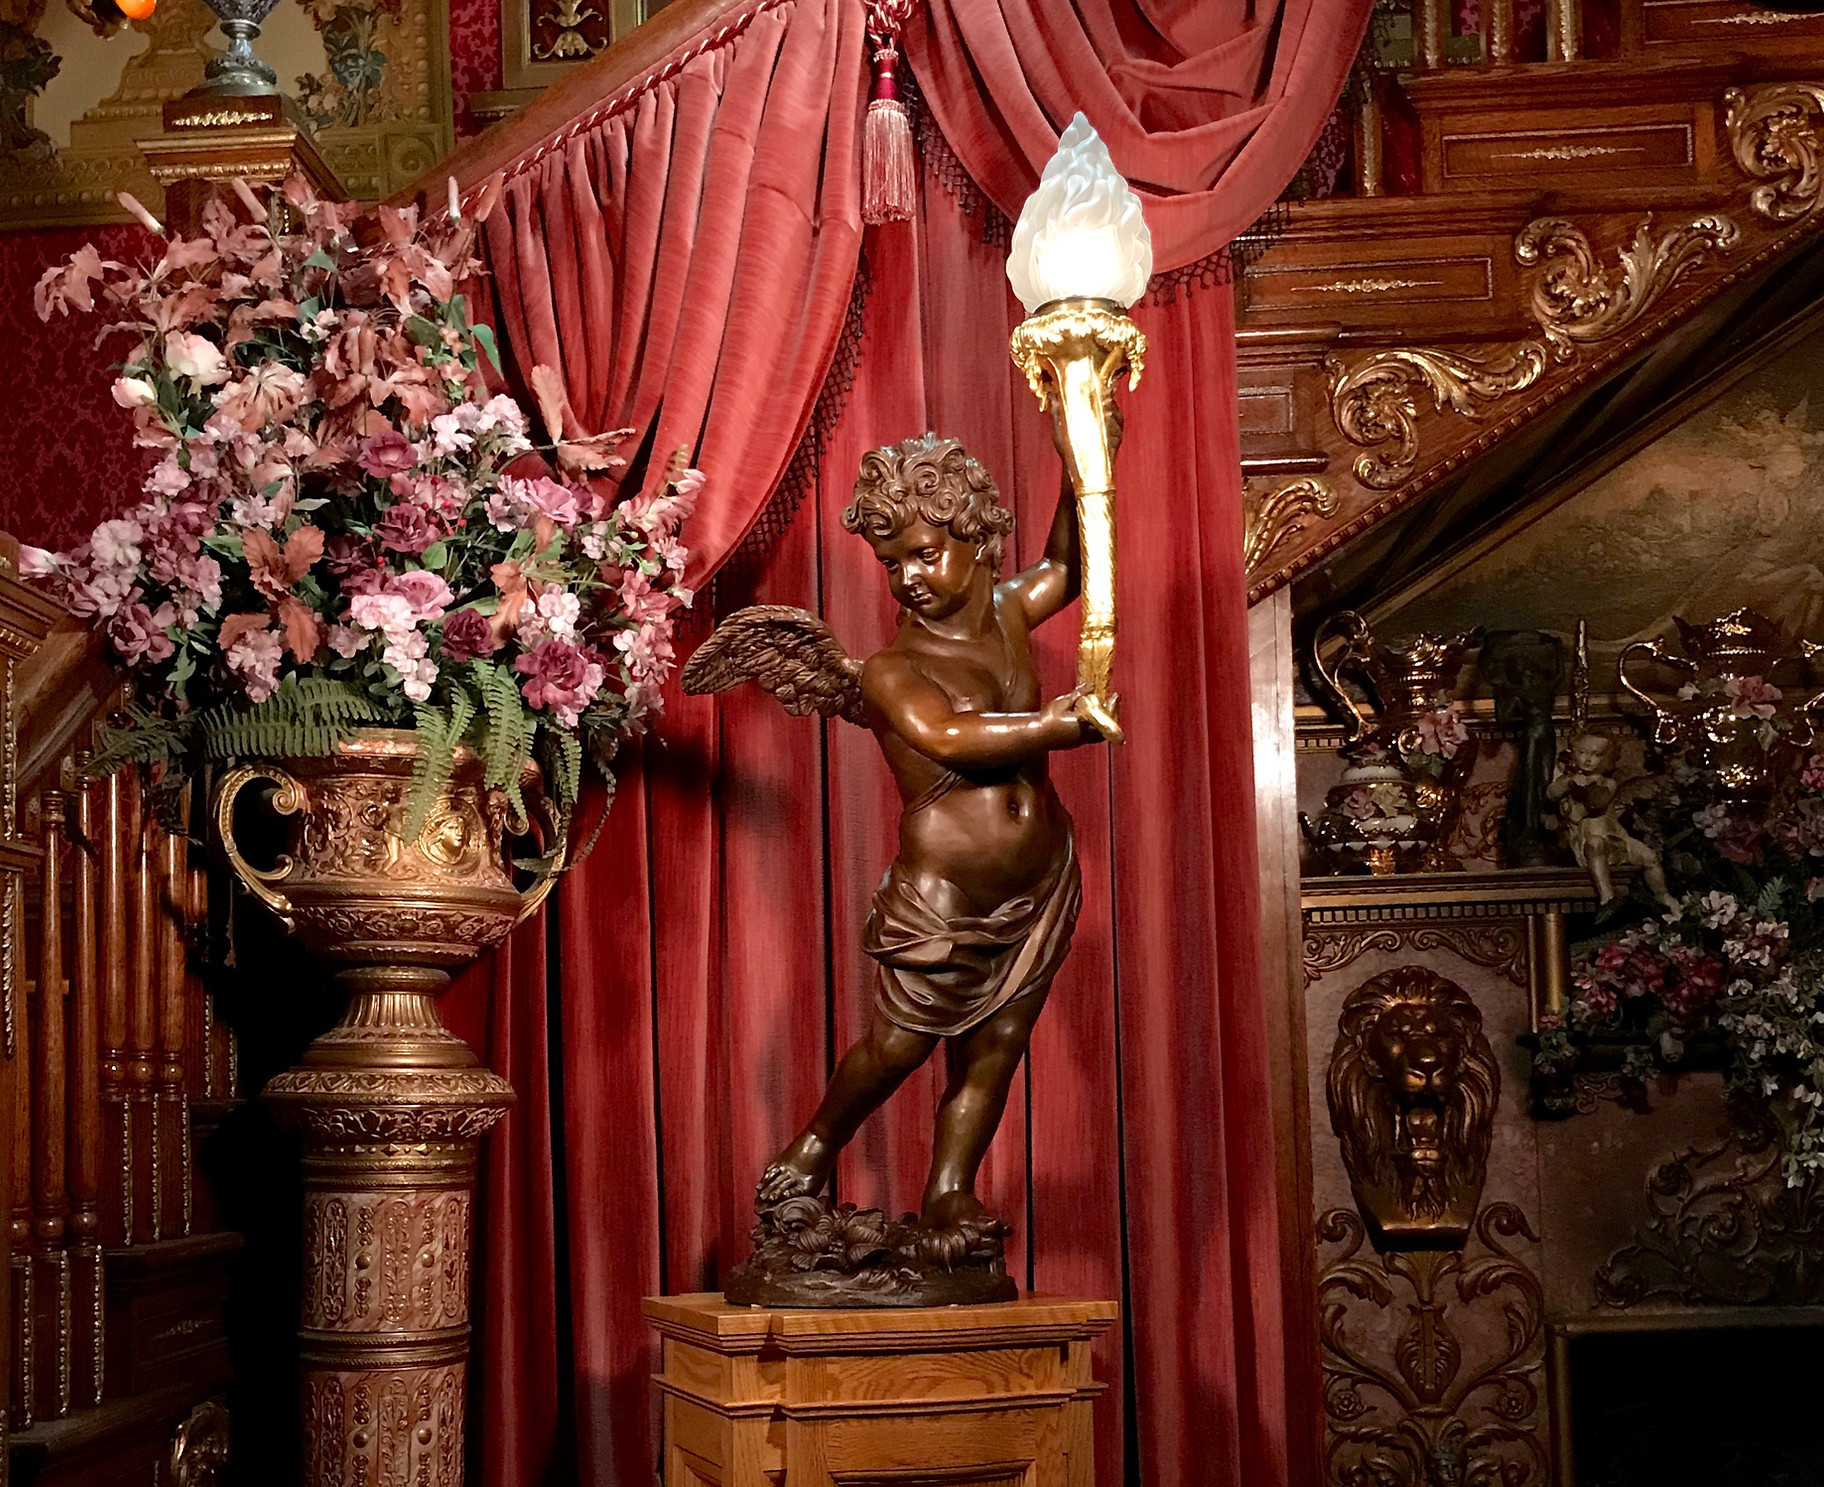 RMS Titanic bronze cherub lamp replica with 24 karat gold torch